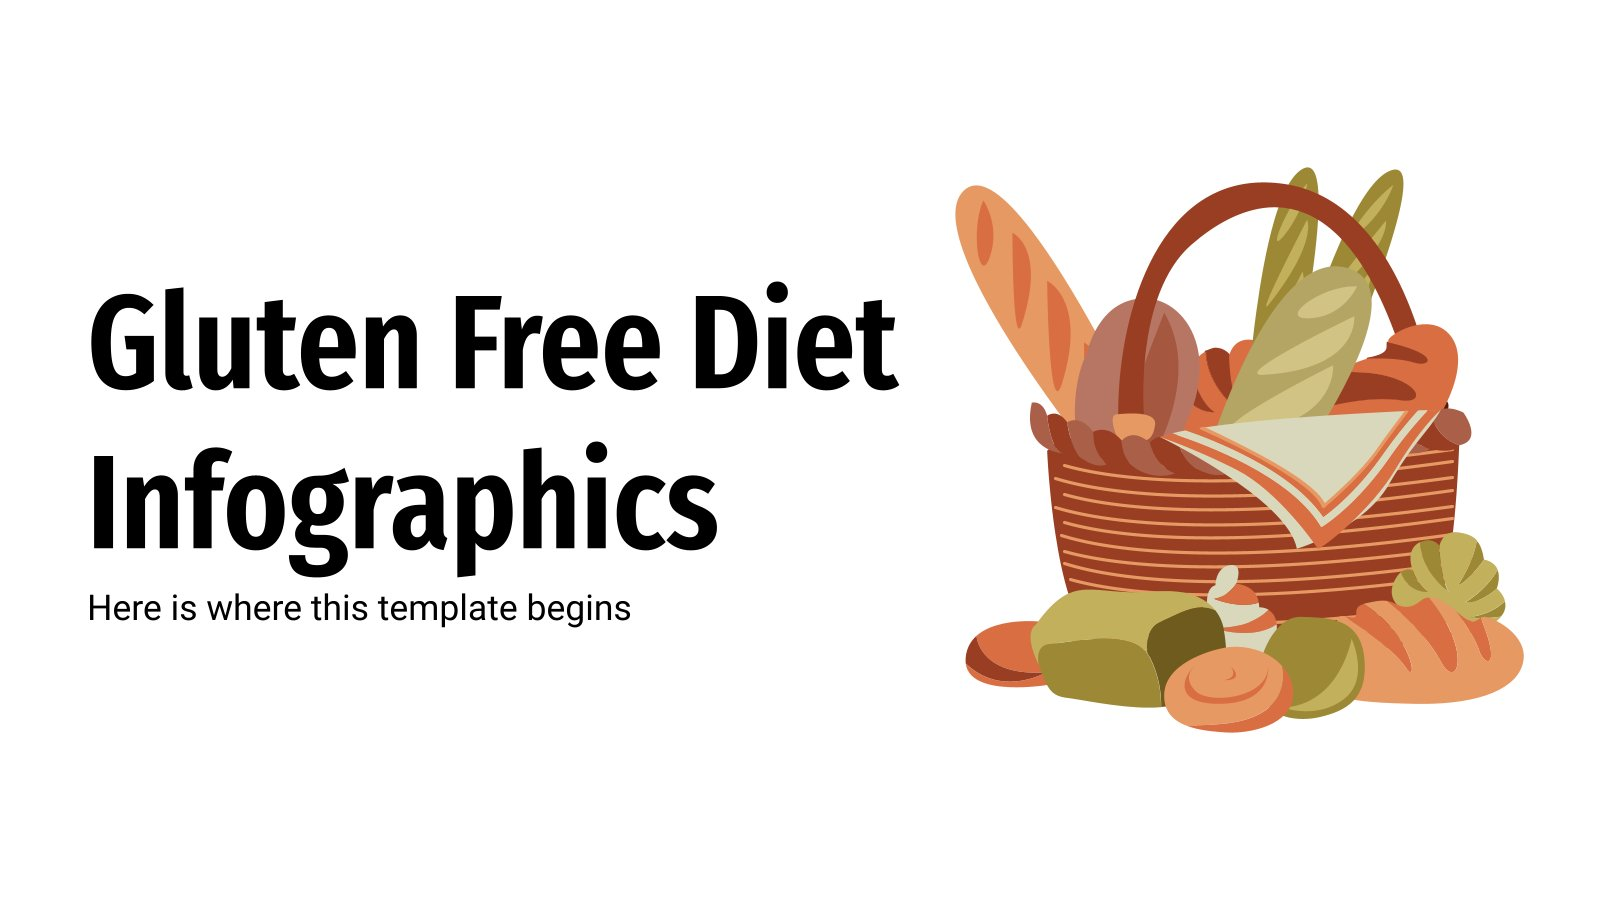 Gluten Free Diet Infographics presentation template